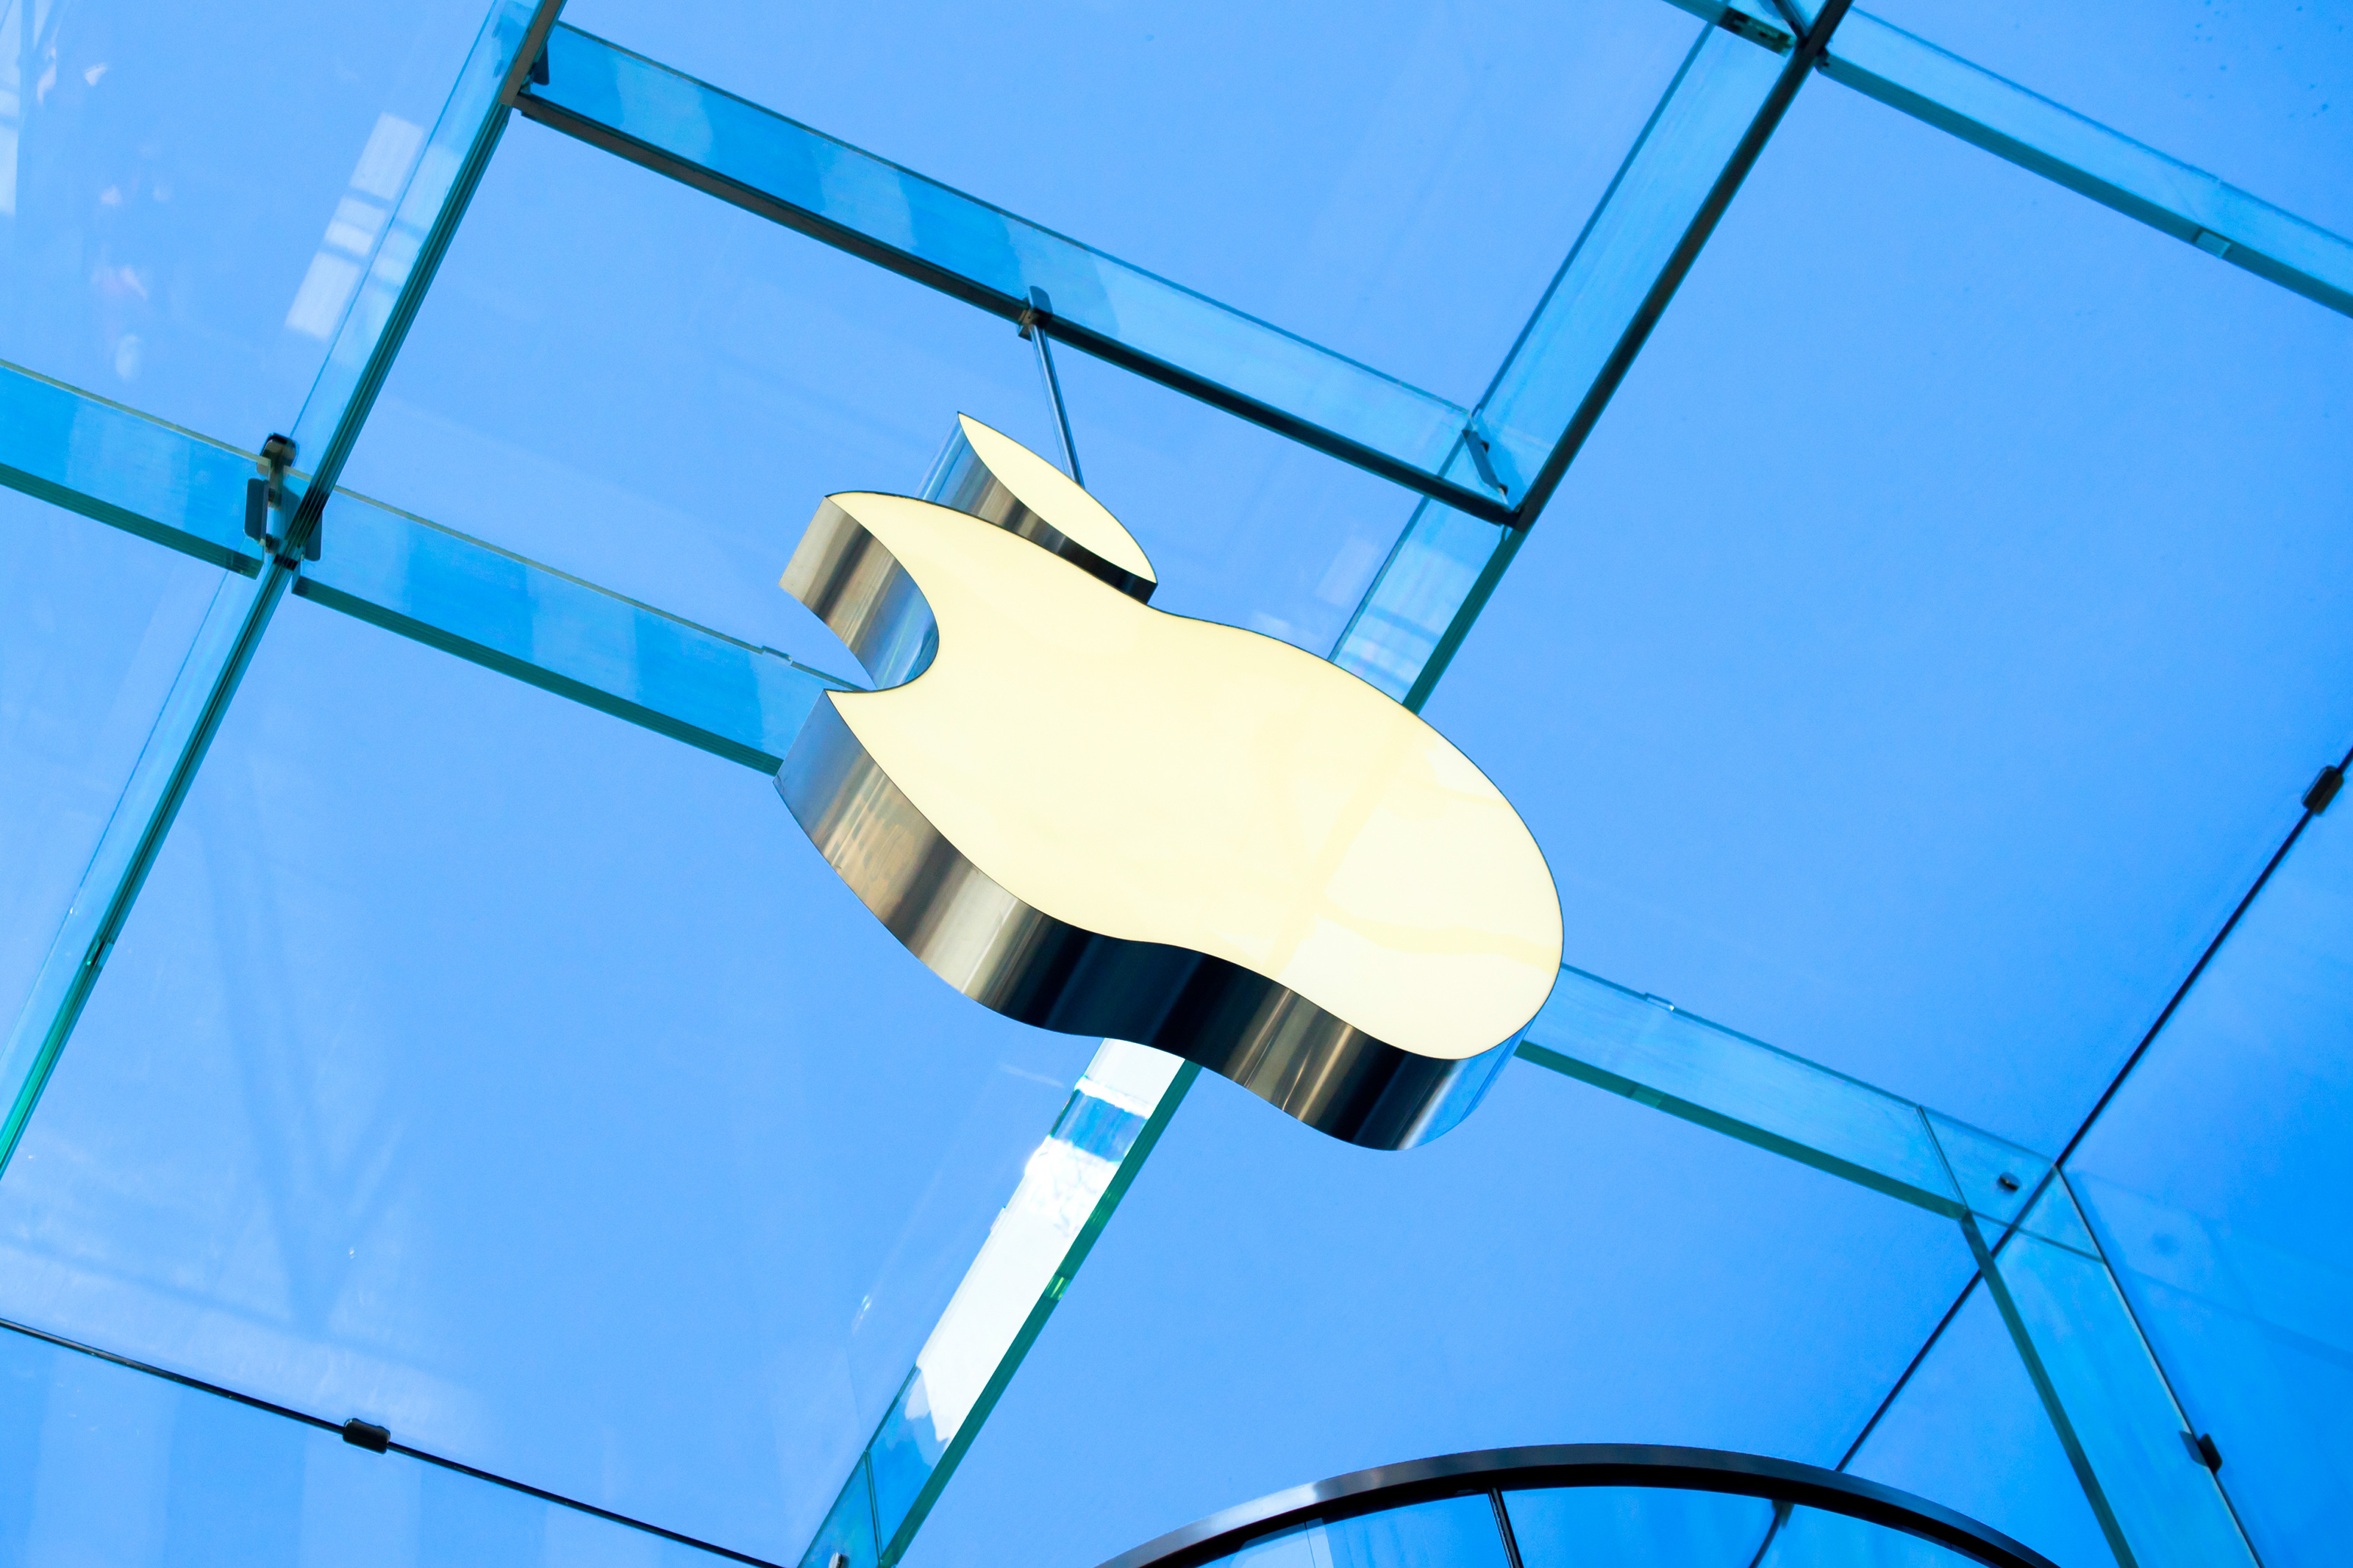 Logo da Apple visto de baixo numa loja